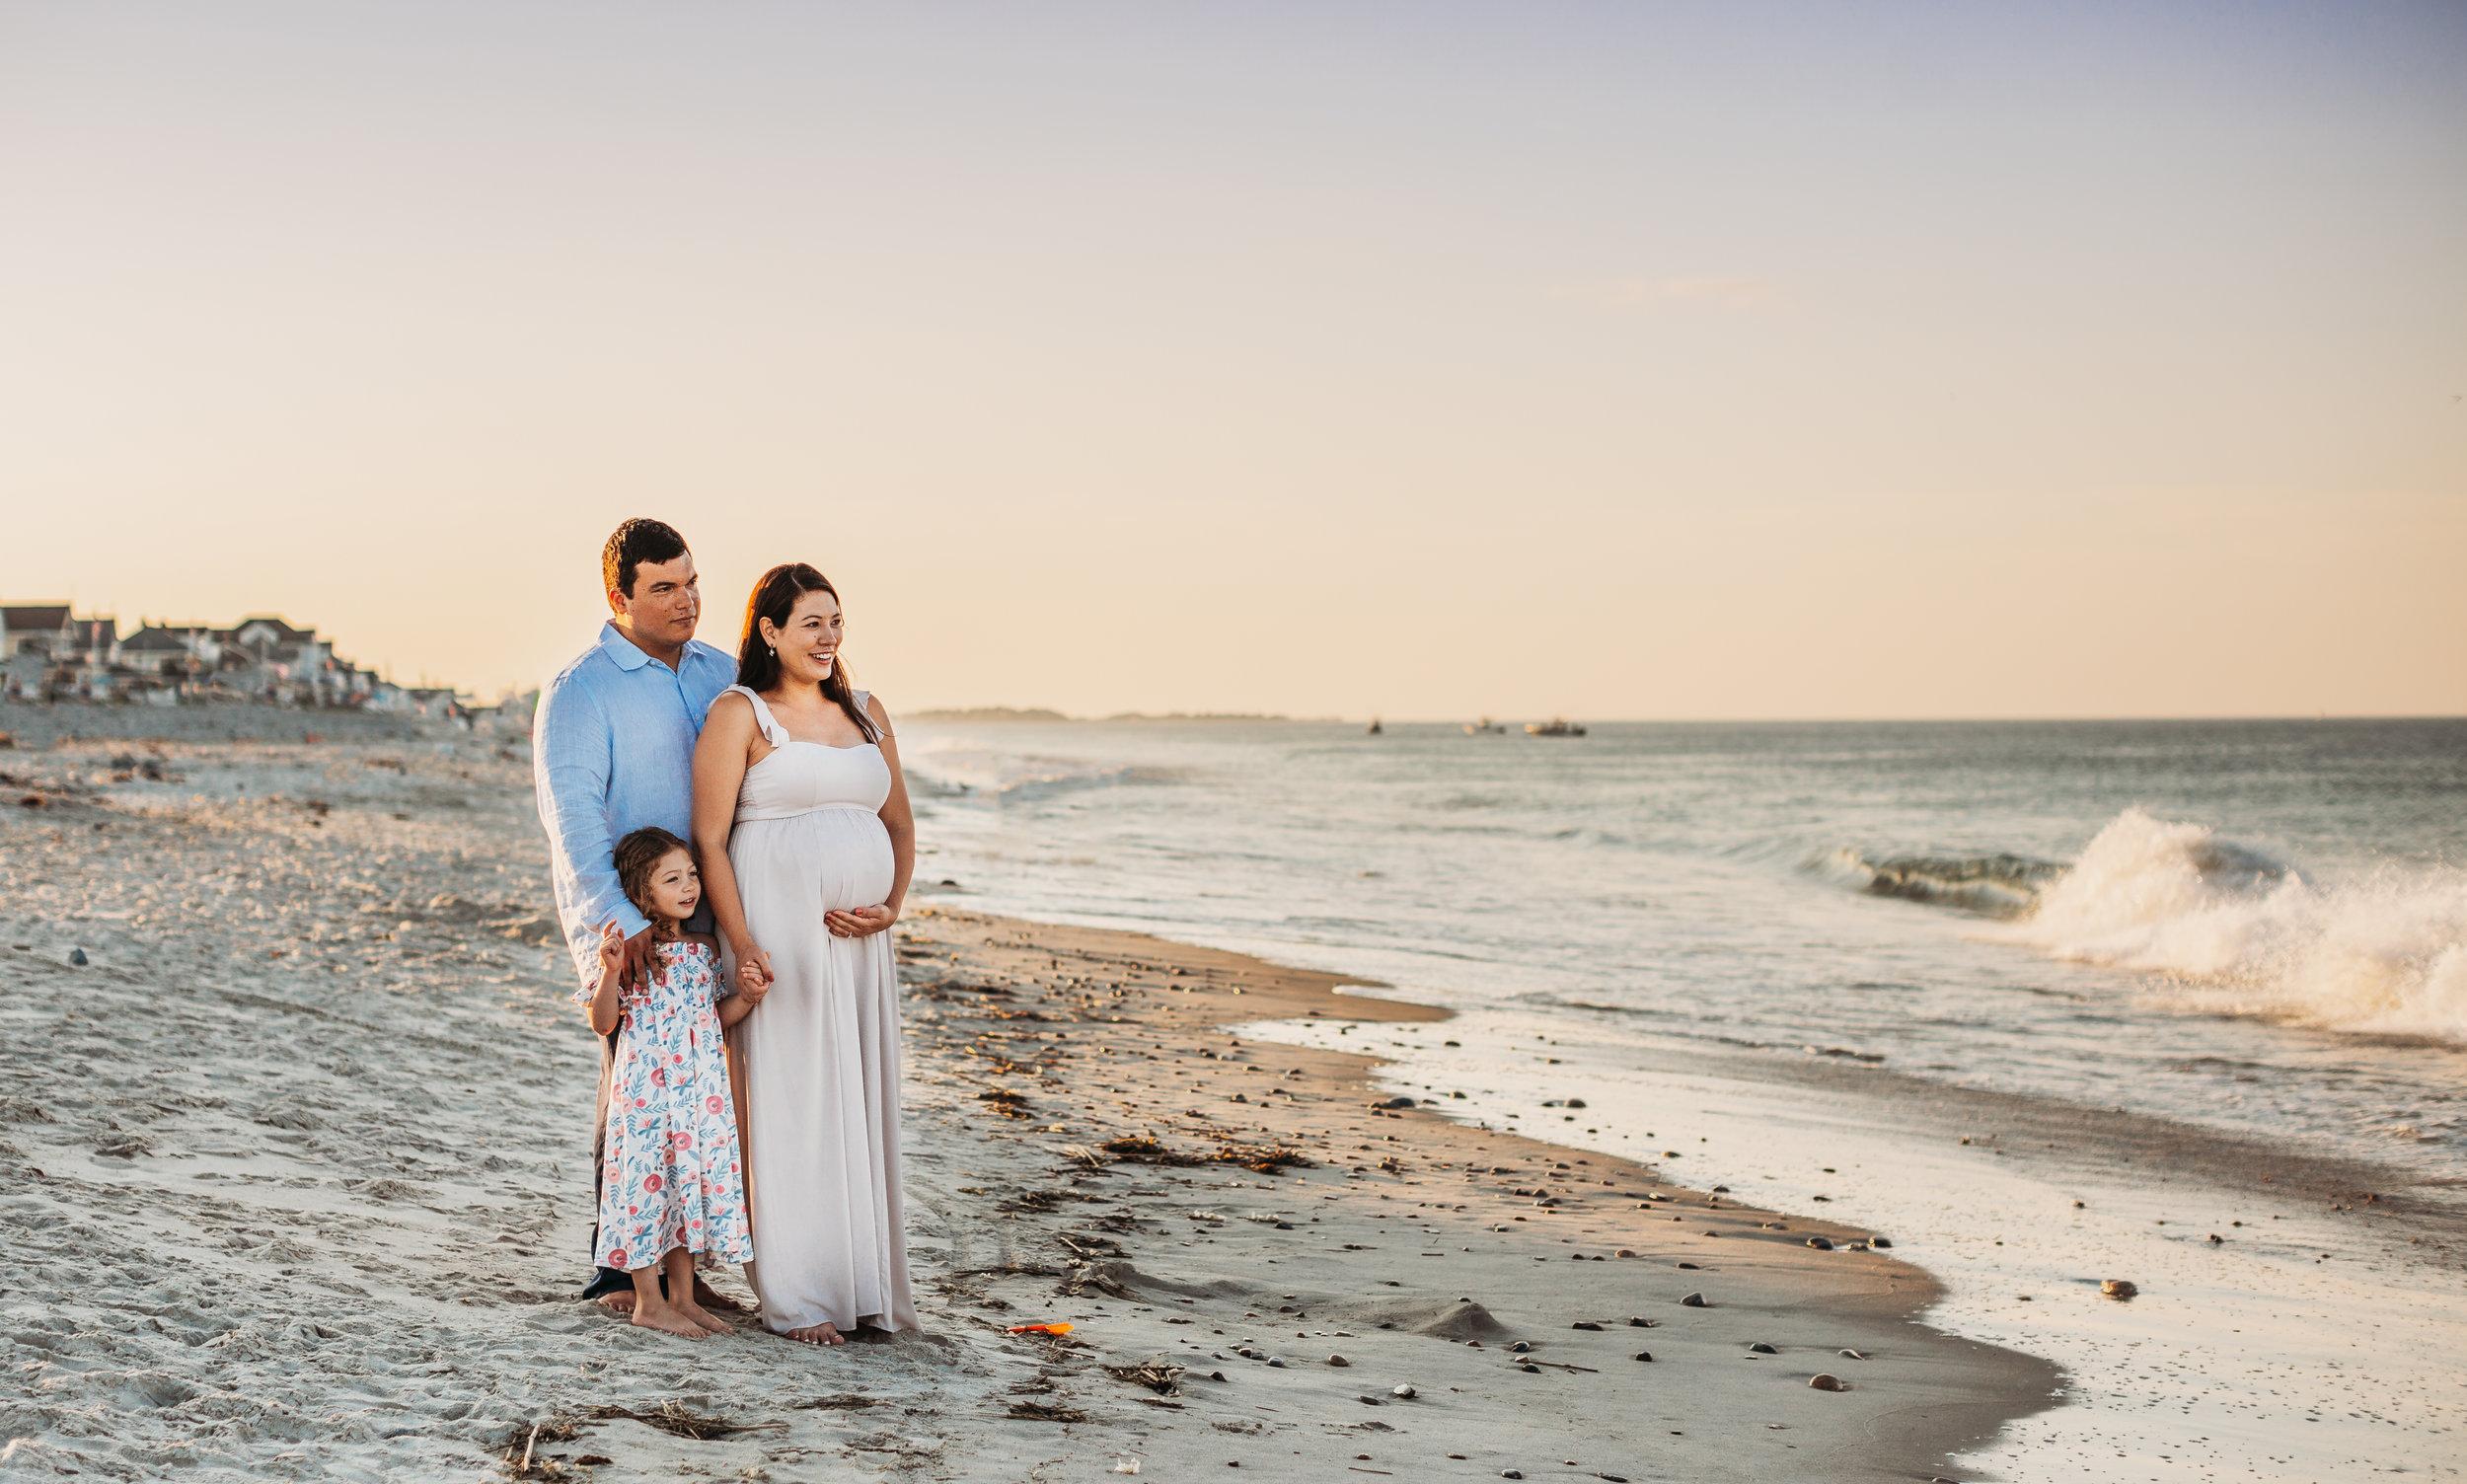 Christine: Scituate Beach Maternity Session | Boston Family Photographer